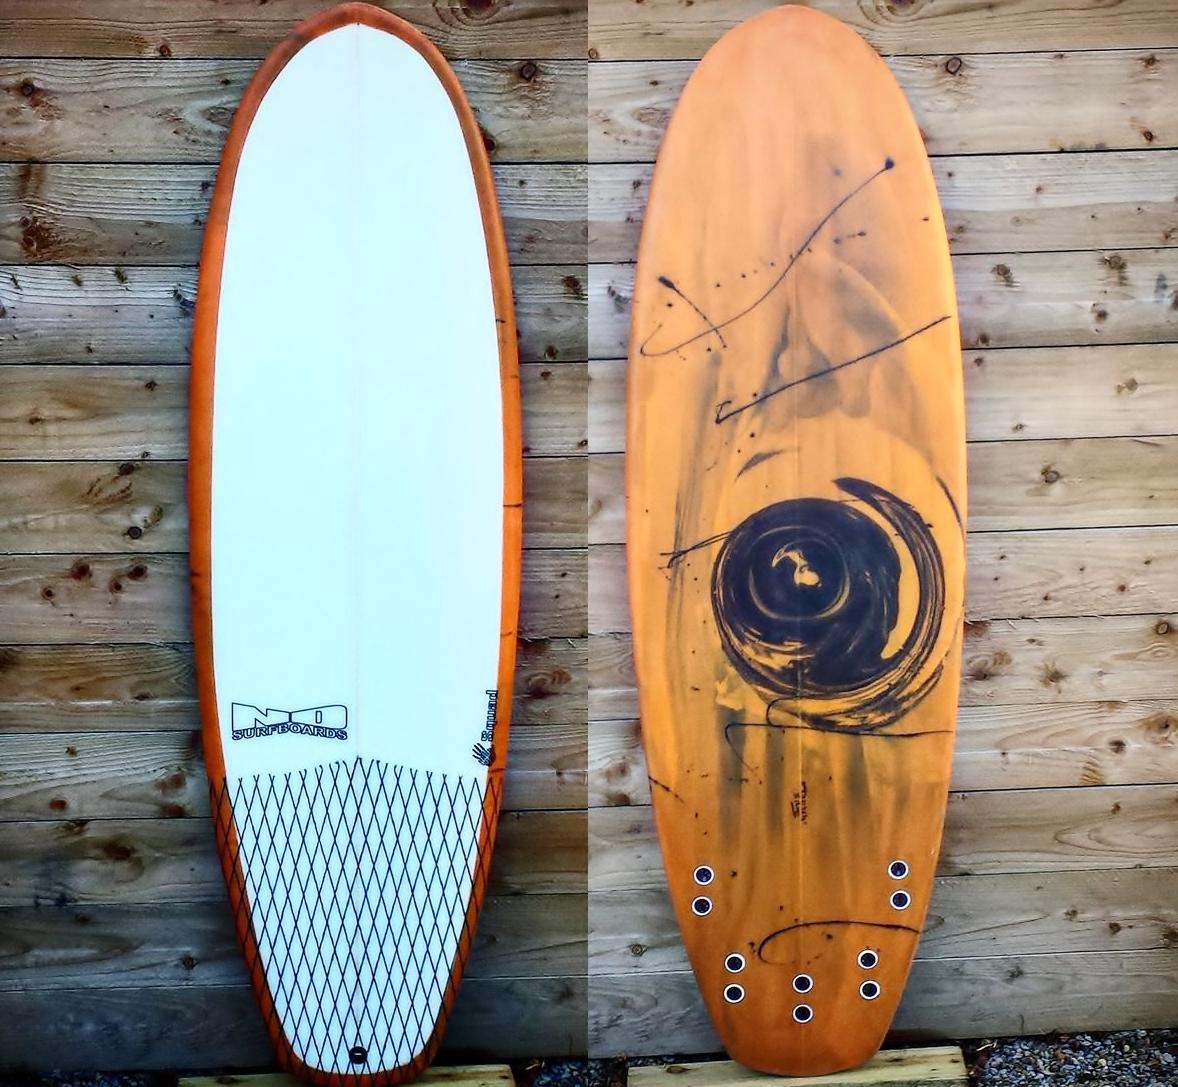 Squad funboard nd surfboards uk for Hybrid fish surfboard